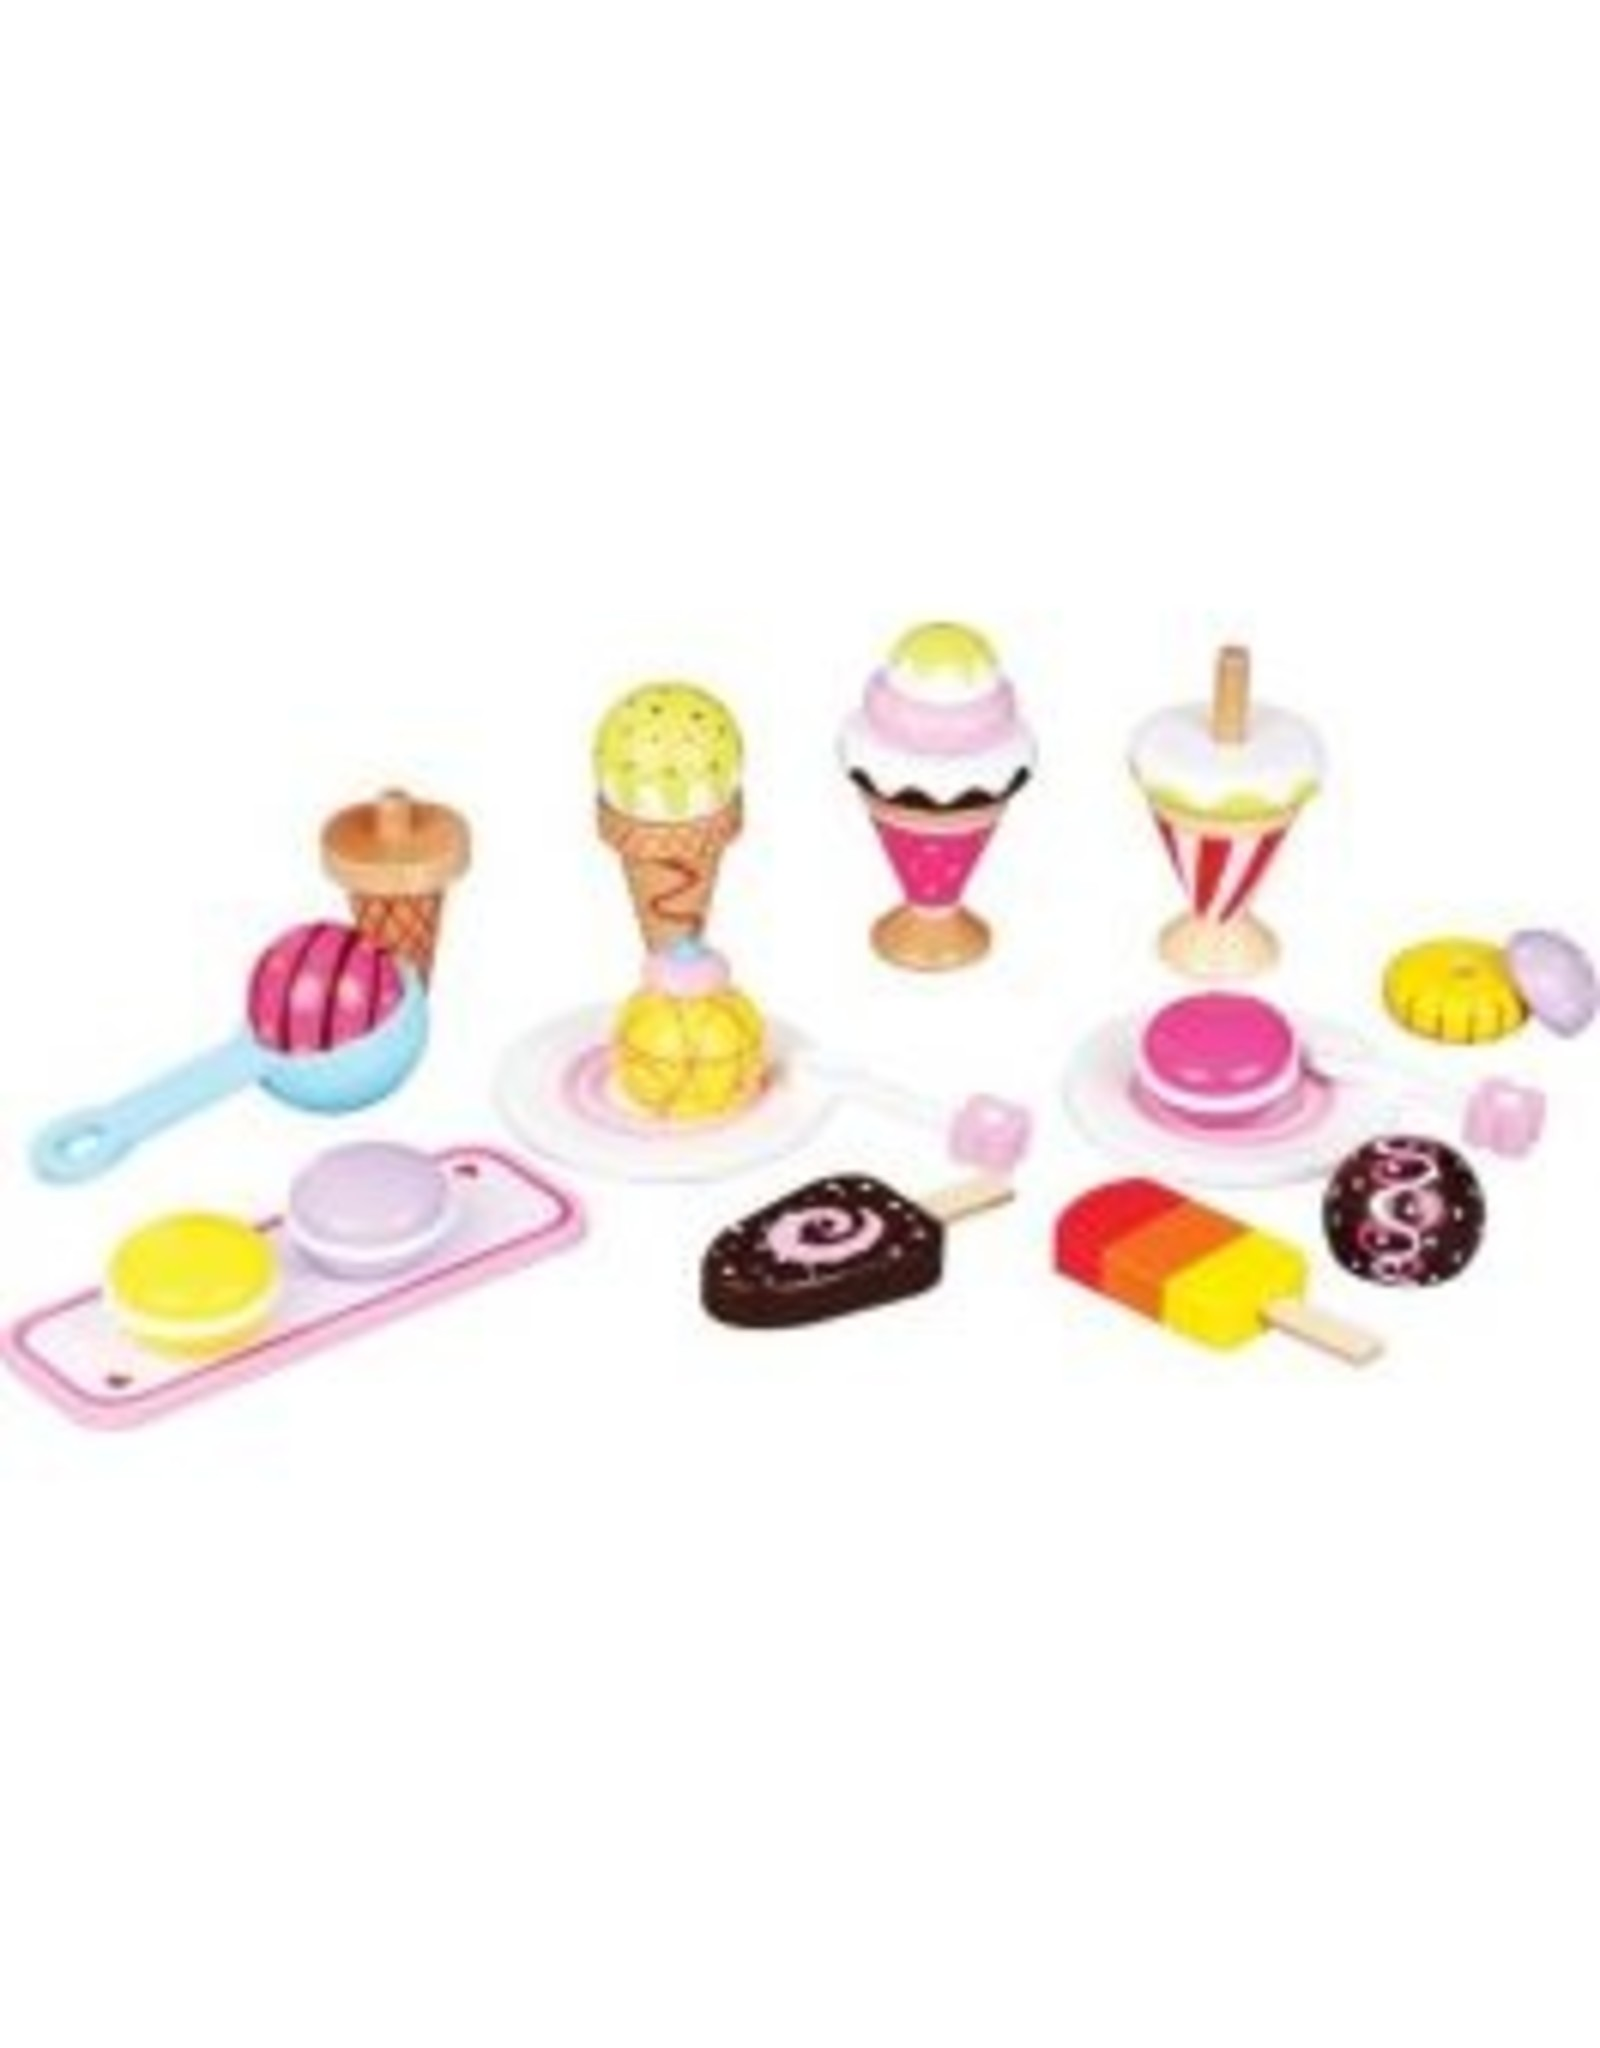 New Classic Toys - Luxe Speelgoed IJs Set - 21 delig